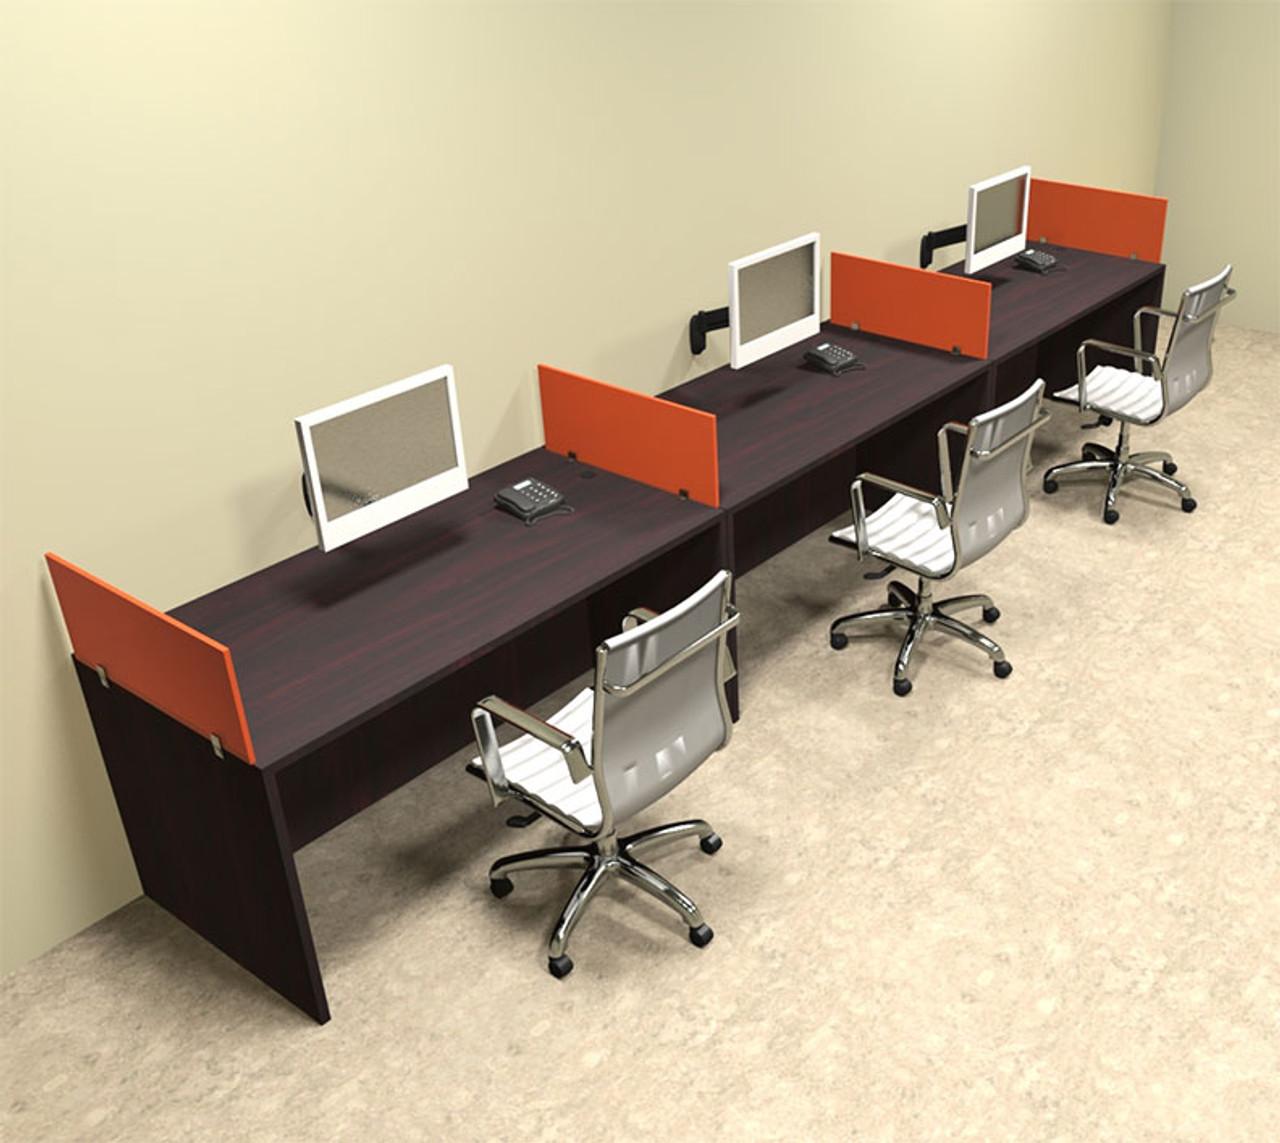 Three Person Orange Divider Office Workstation Desk Set, #OT-SUL-SPO7